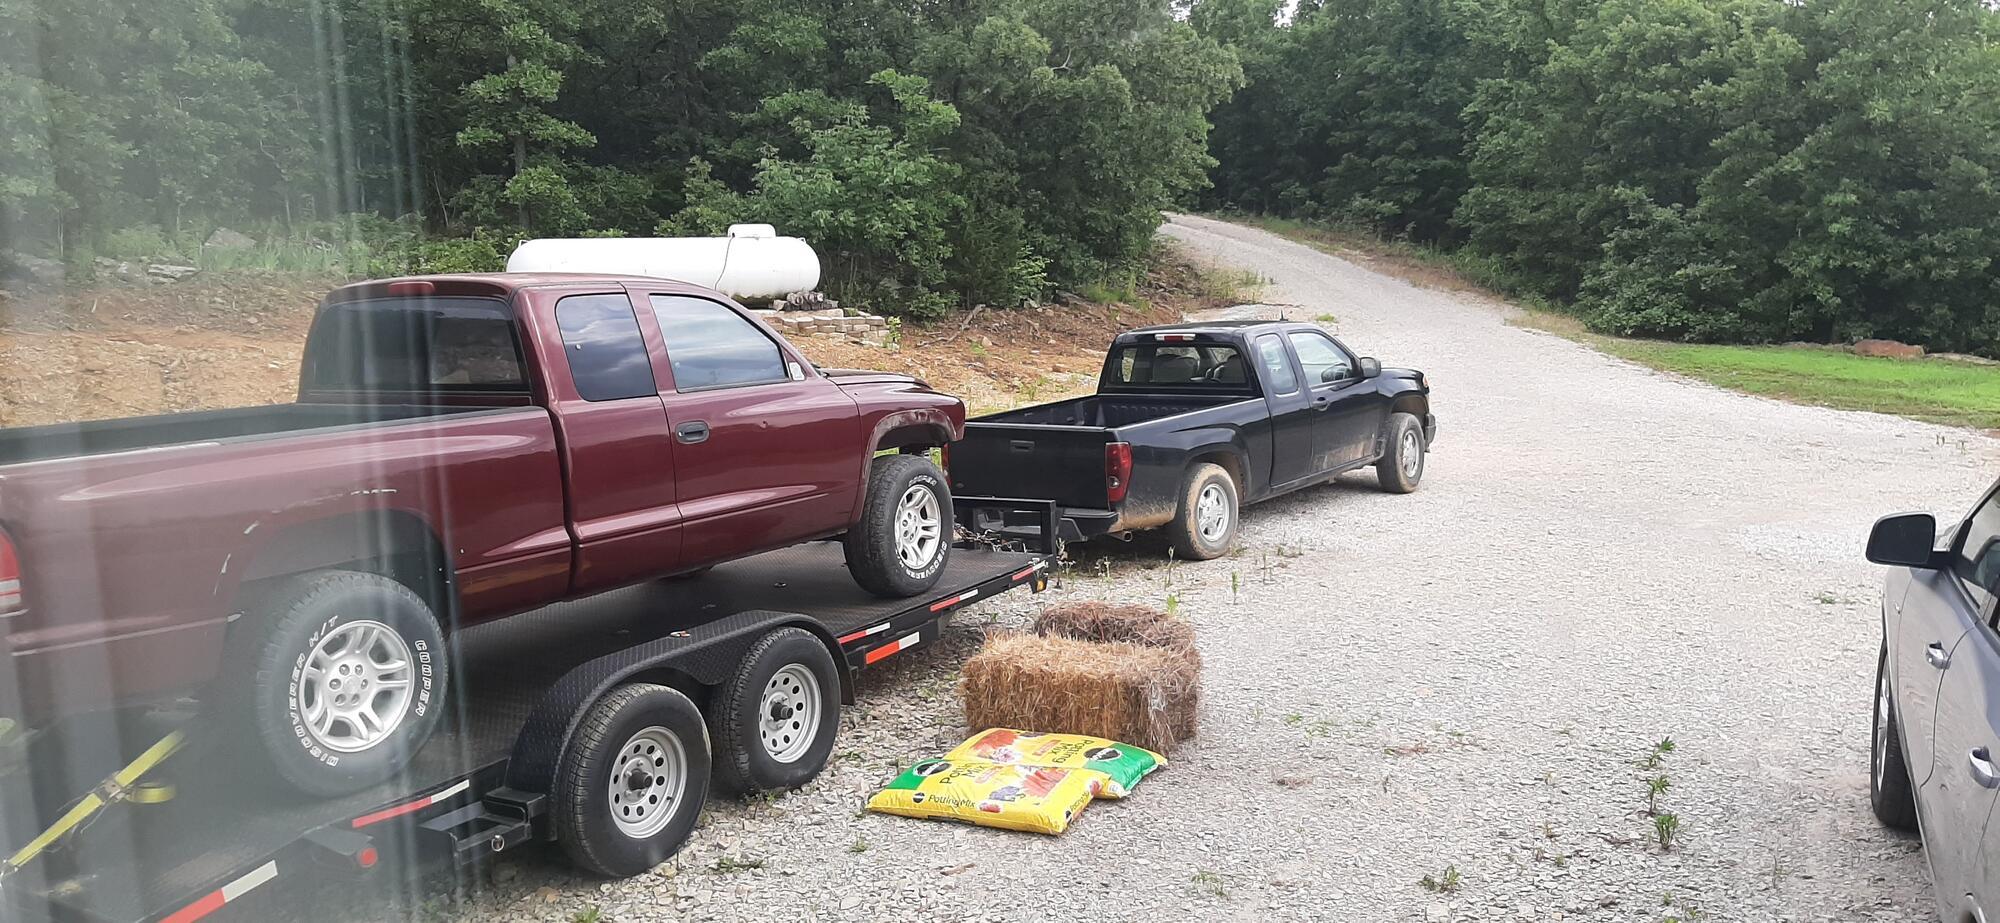 Name:  Dodge on trailer.jpg Views: 456 Size:  367.8 KB